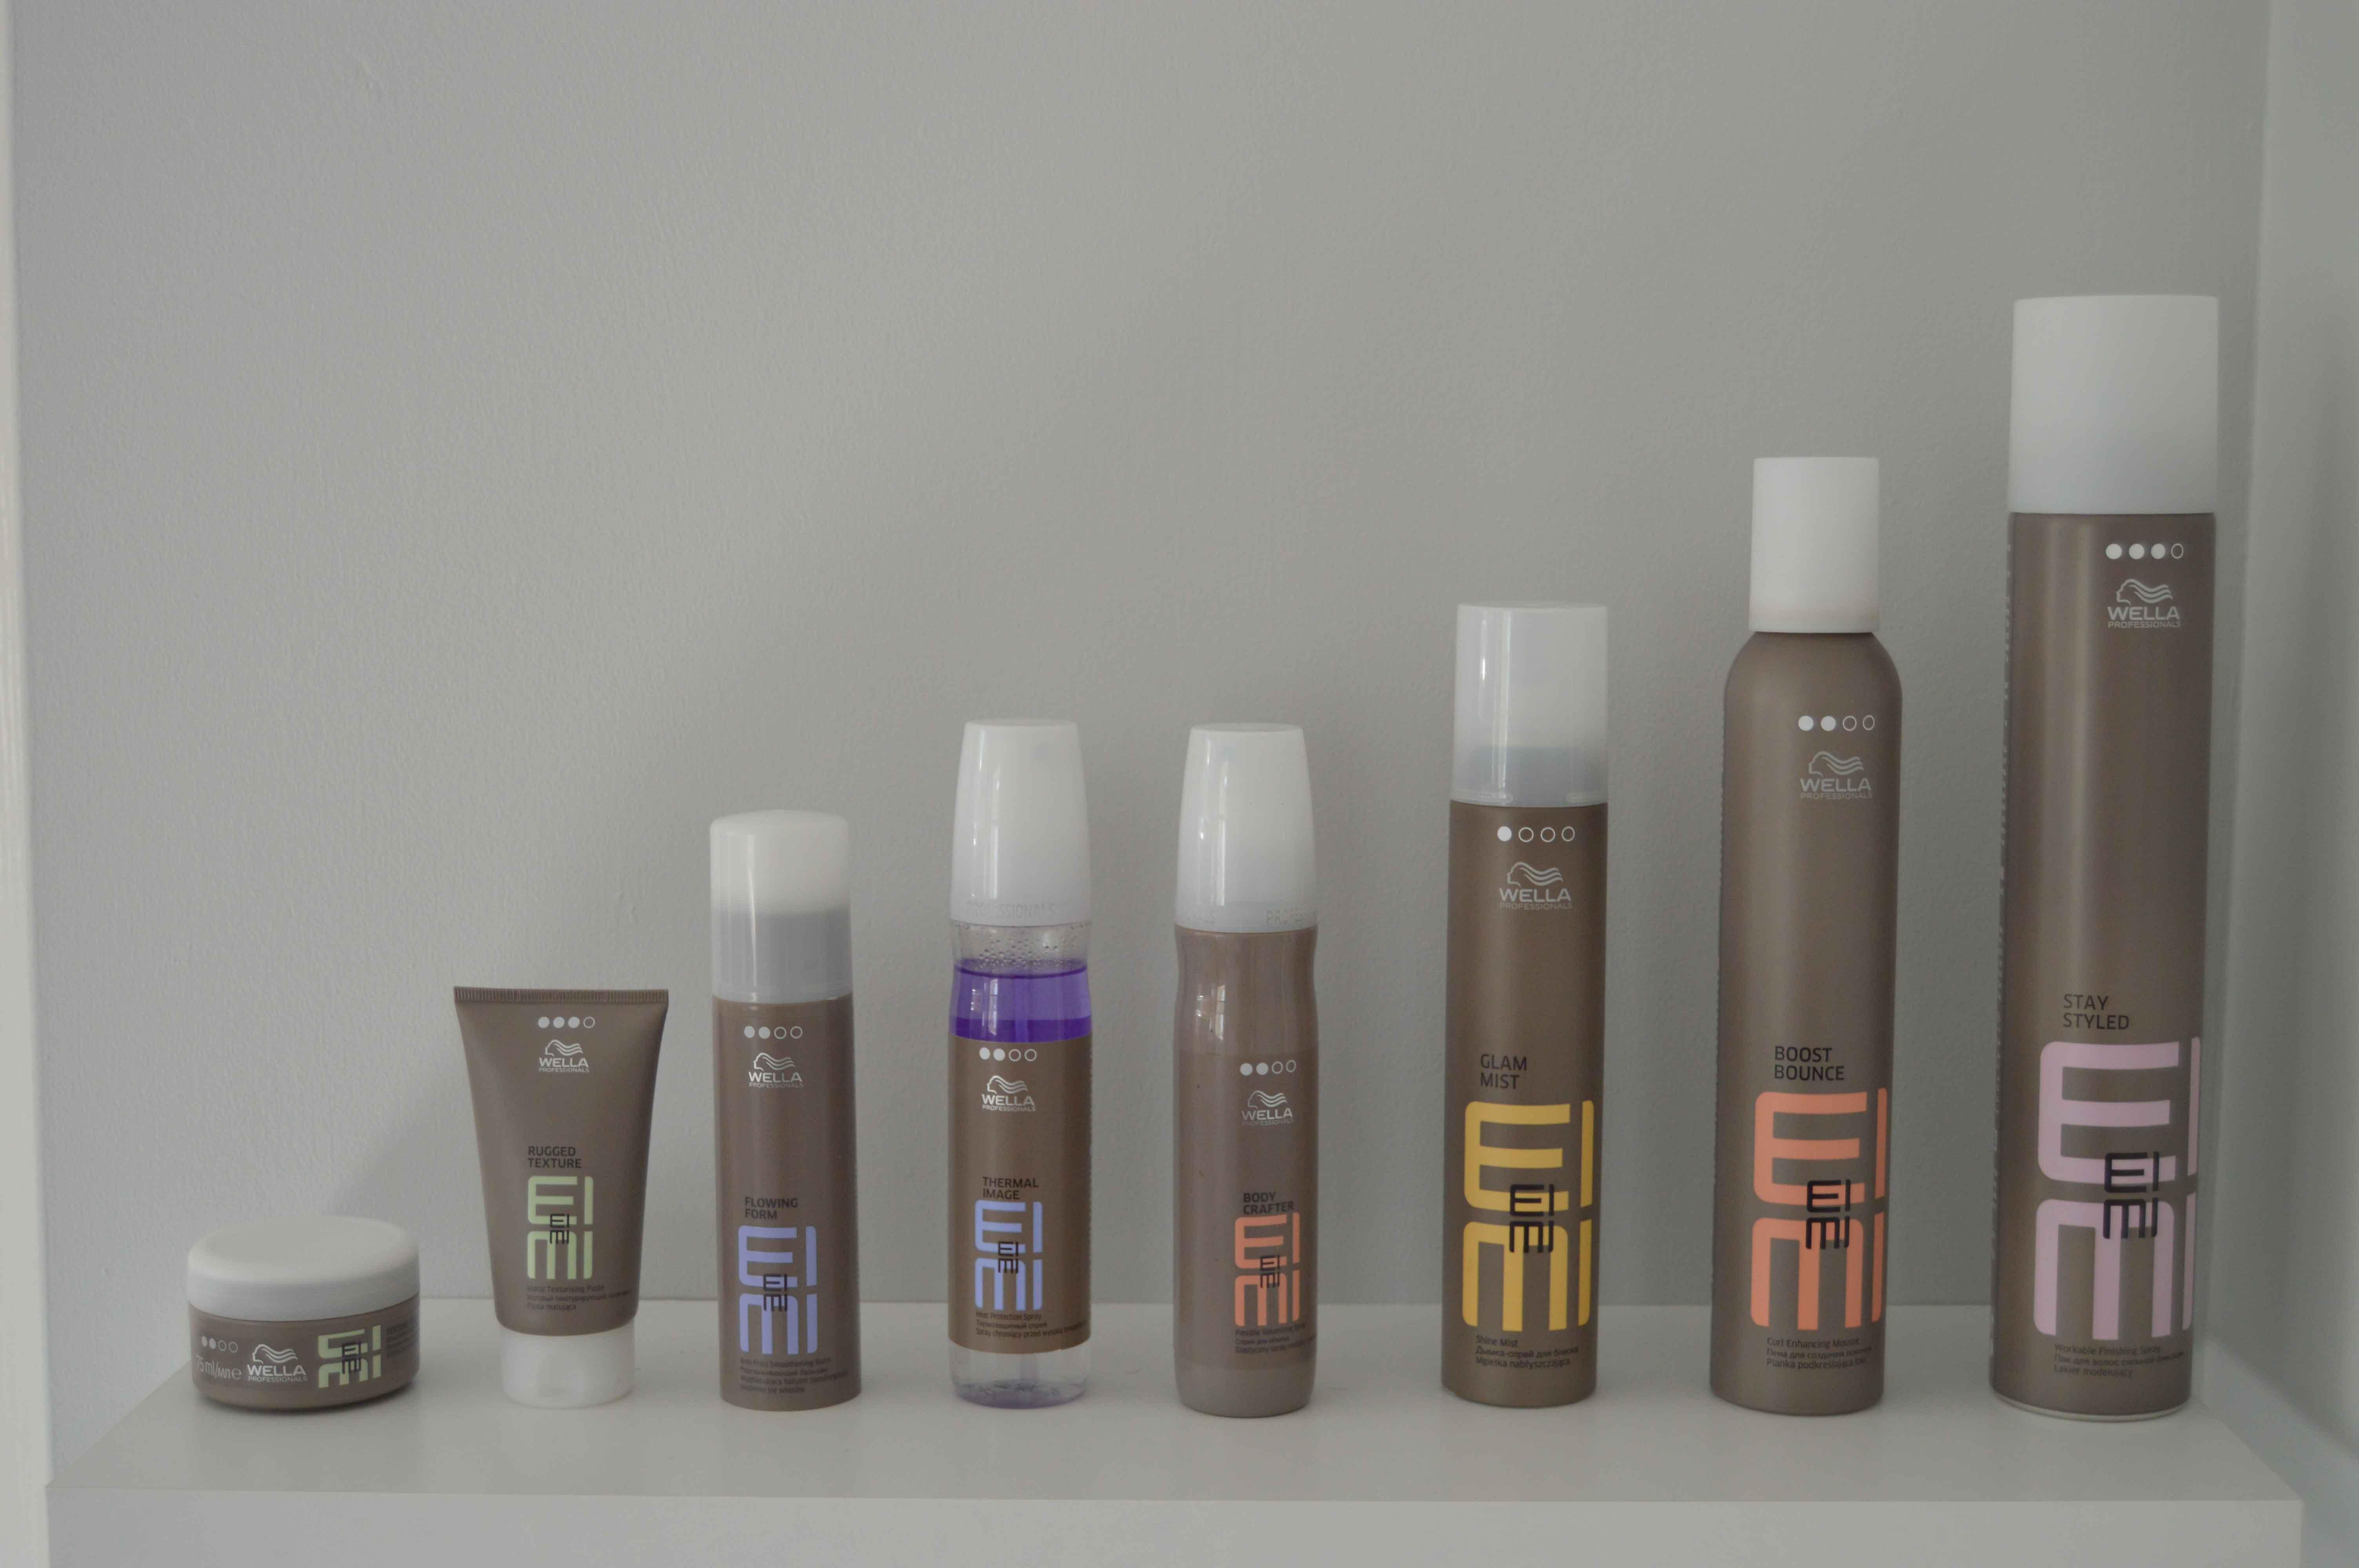 Wella product range